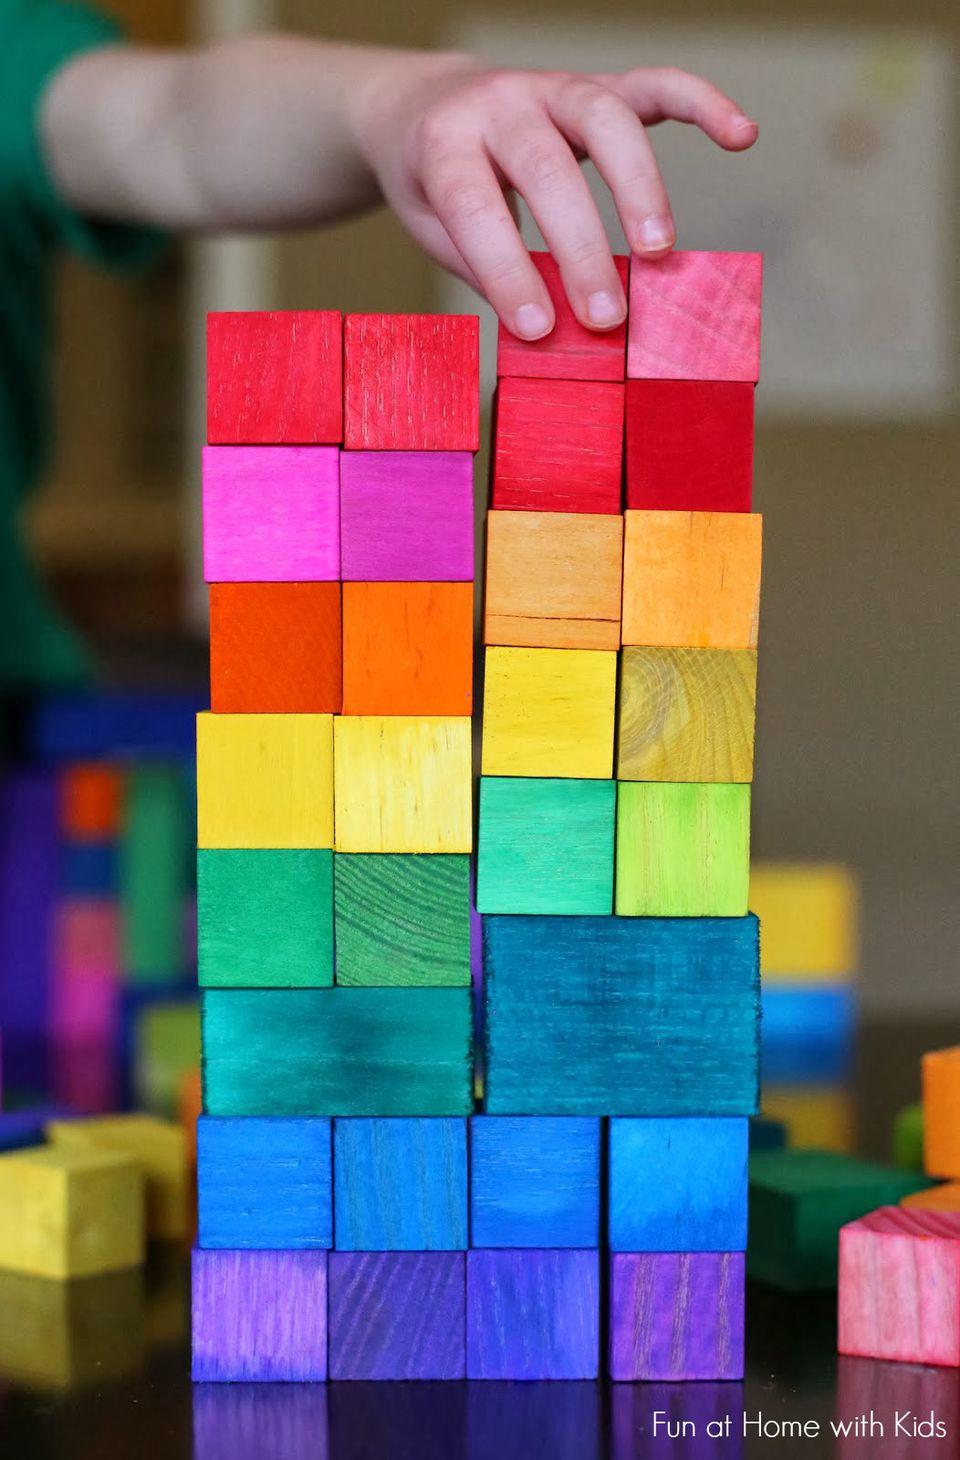 Handmade Rainbow Blocks